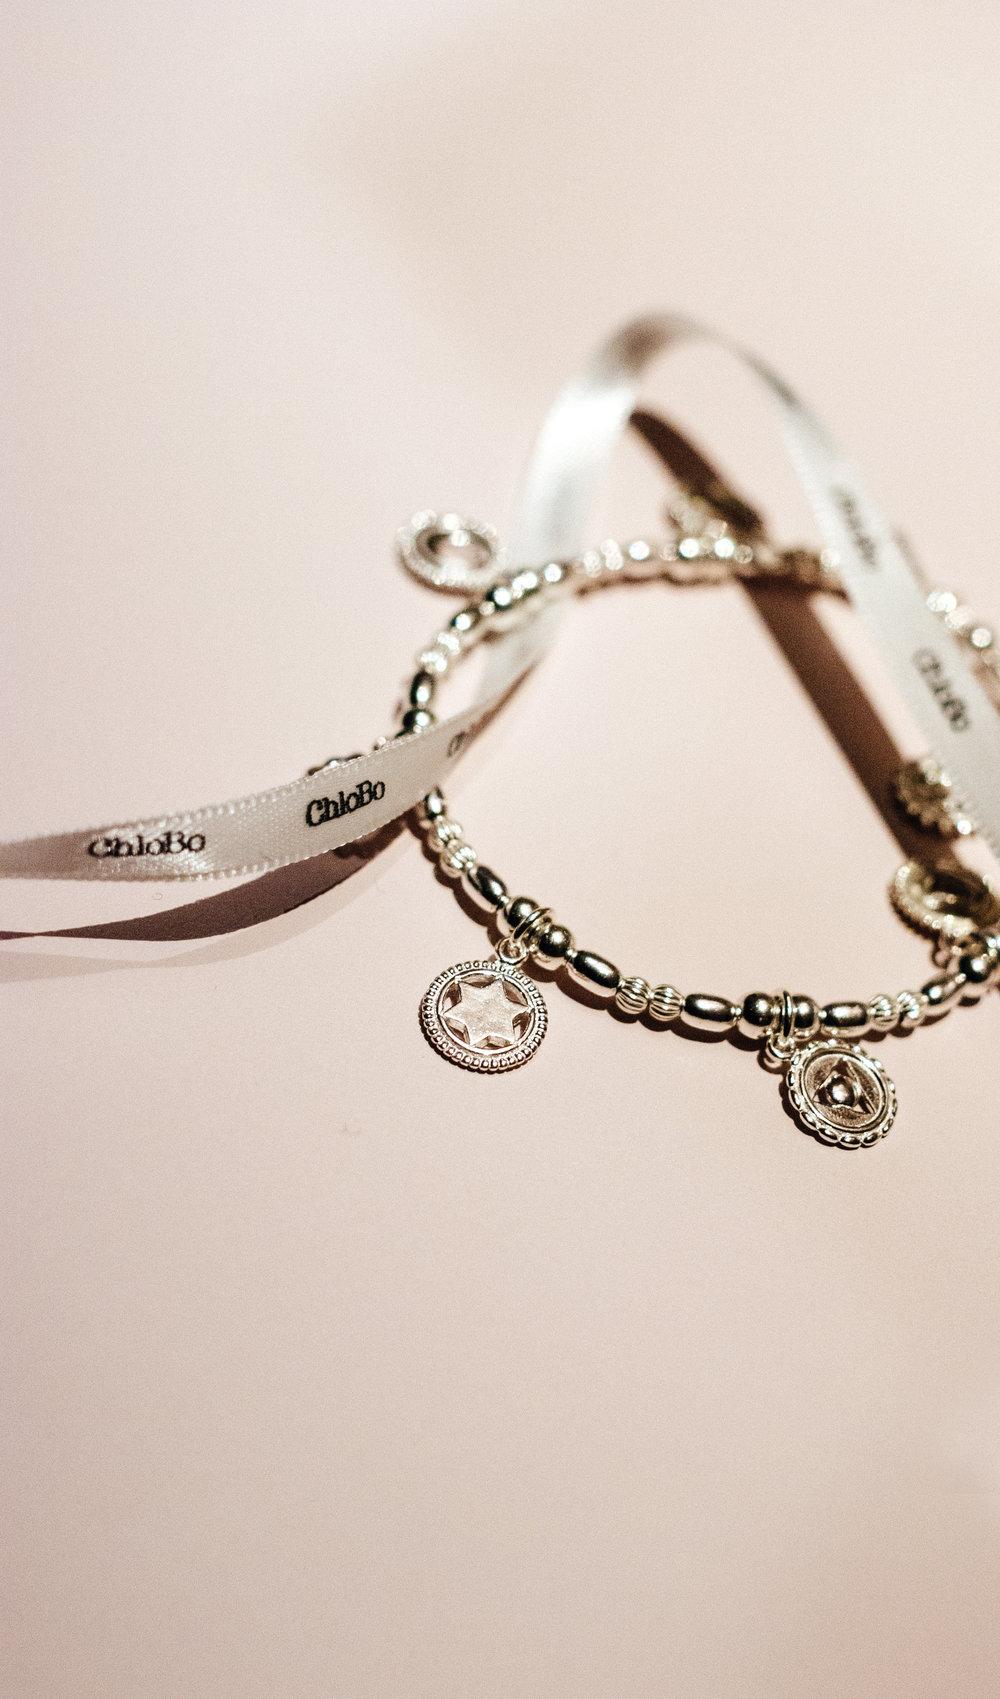 Chlobo jewellery good vibes charm bracelet